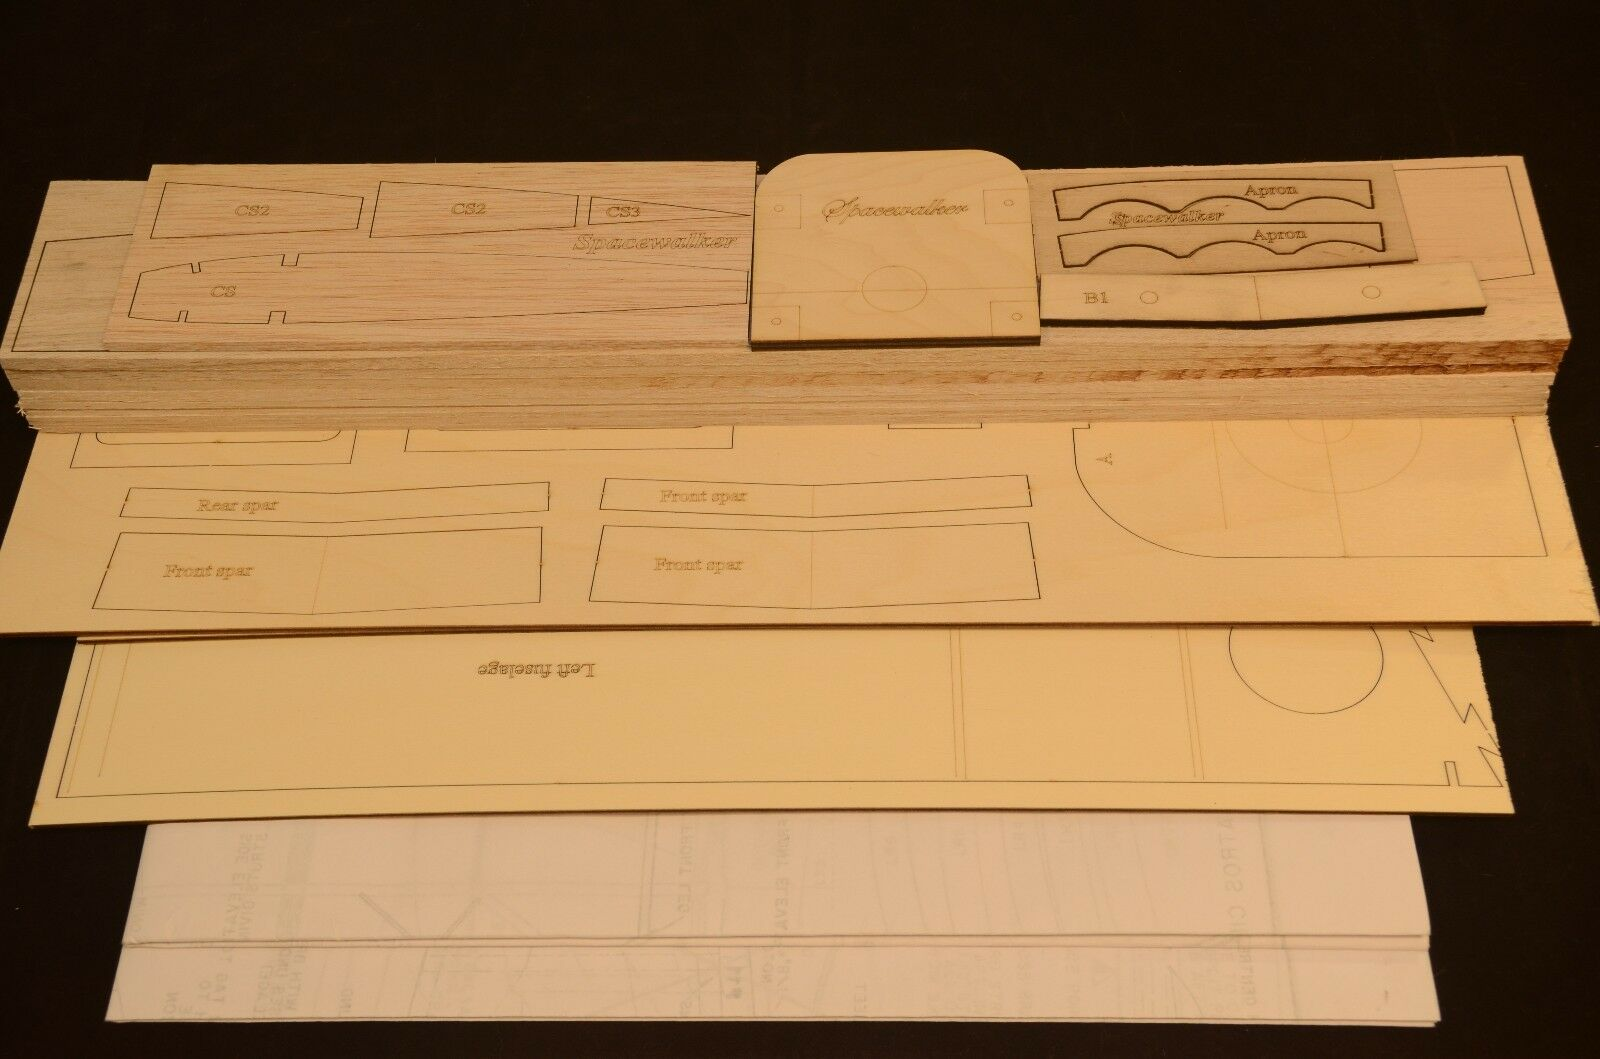 1 4.3 Escala Spacewalker Corte Láser Corta Kit Kit Kit & Planes 78 en Ala Palmo  con 60% de descuento